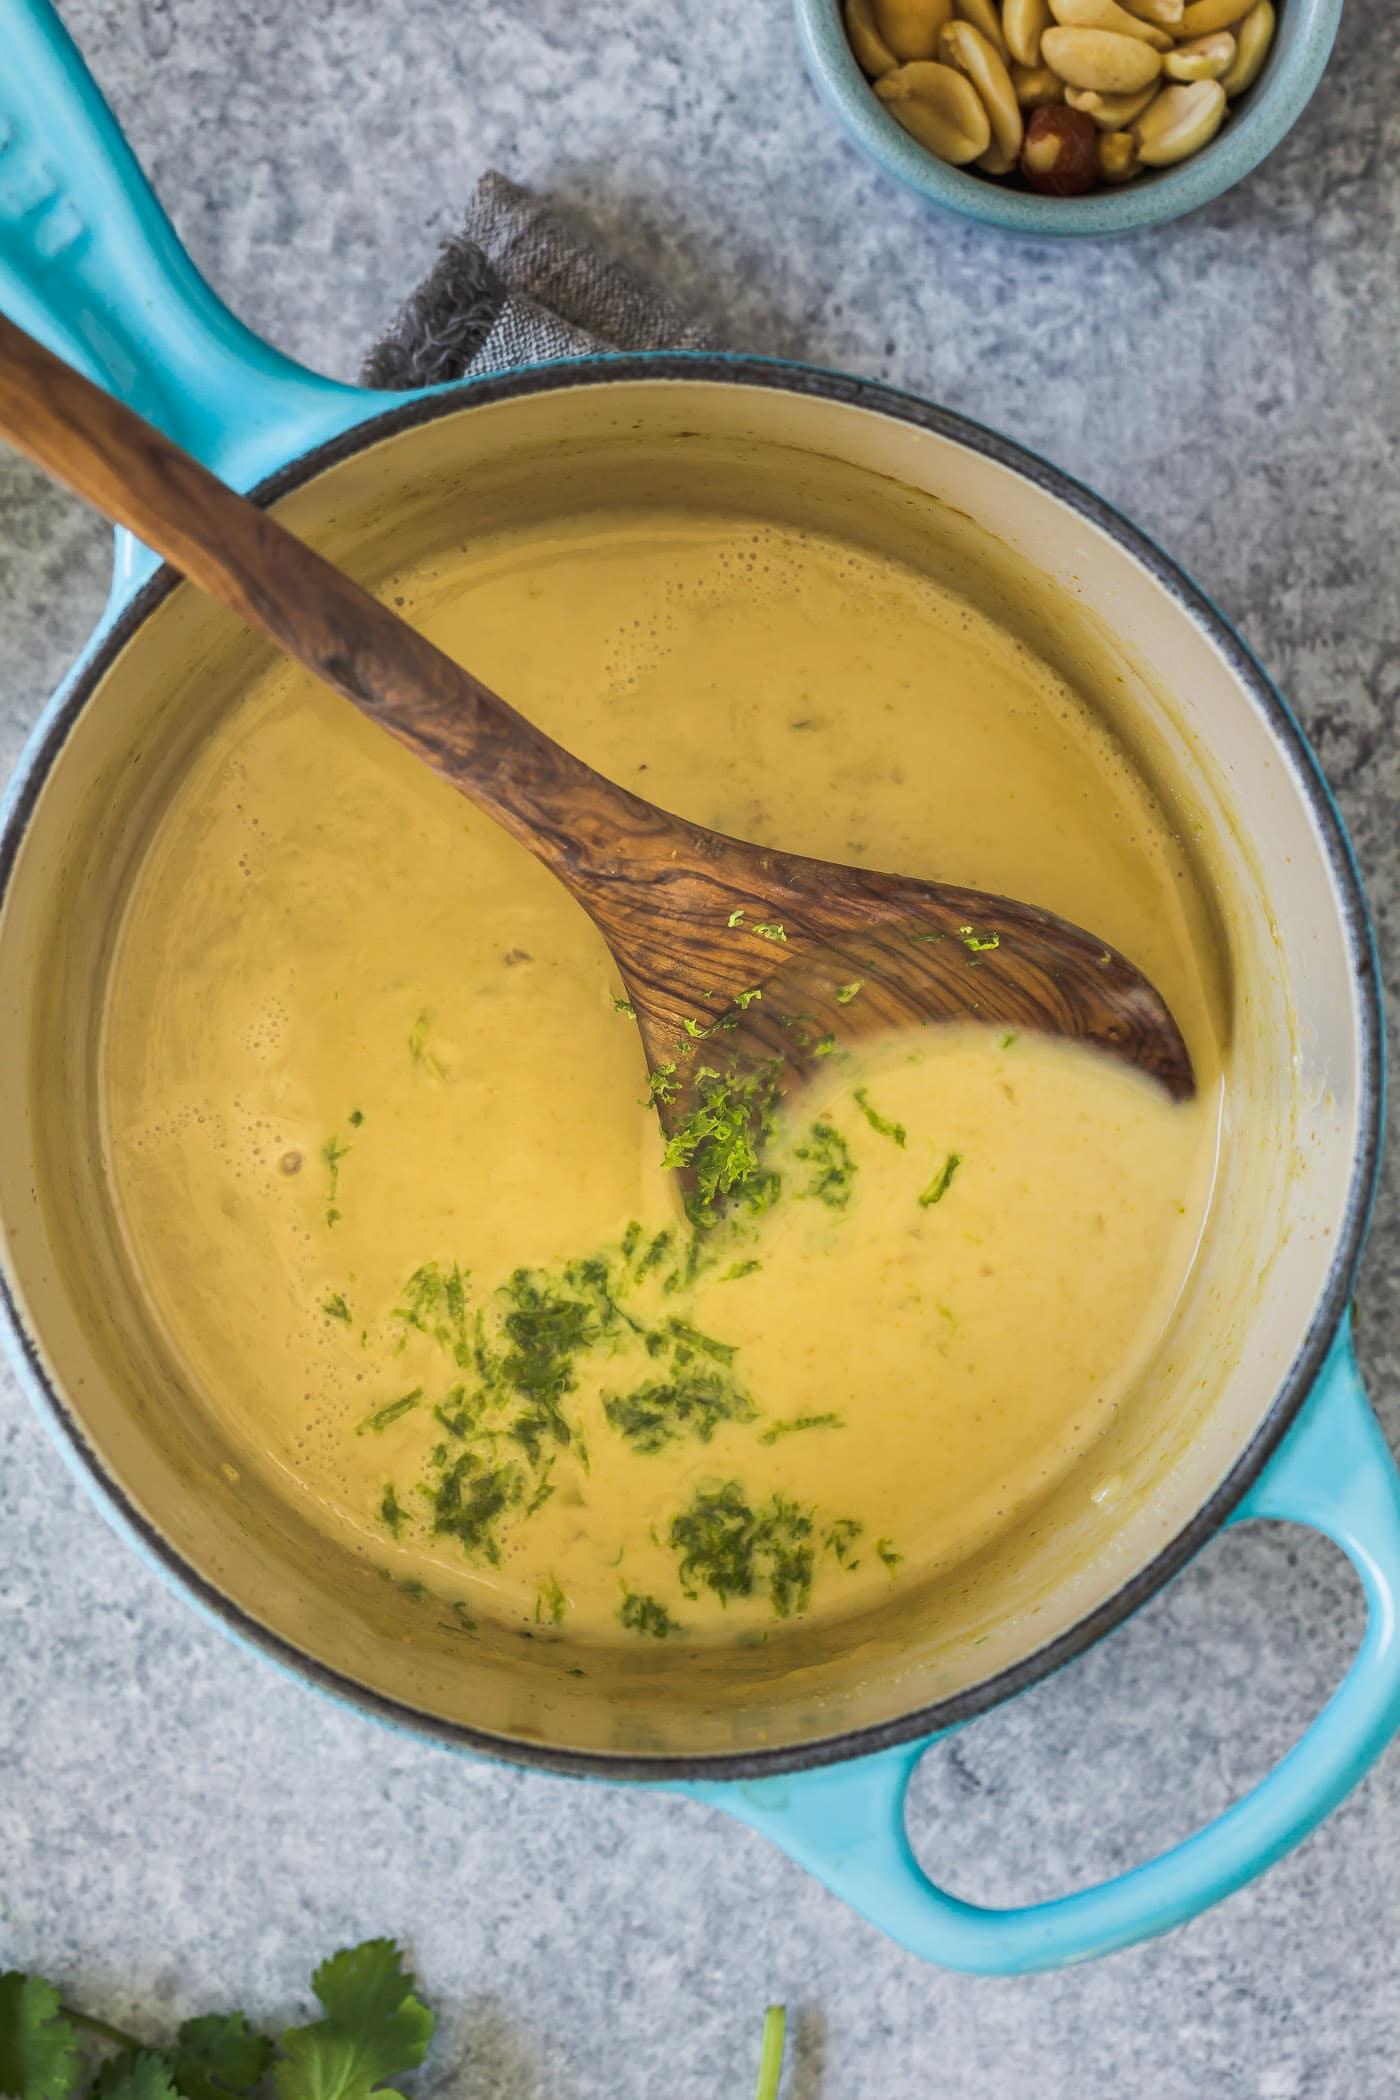 lemongrass curry sauce in the pot